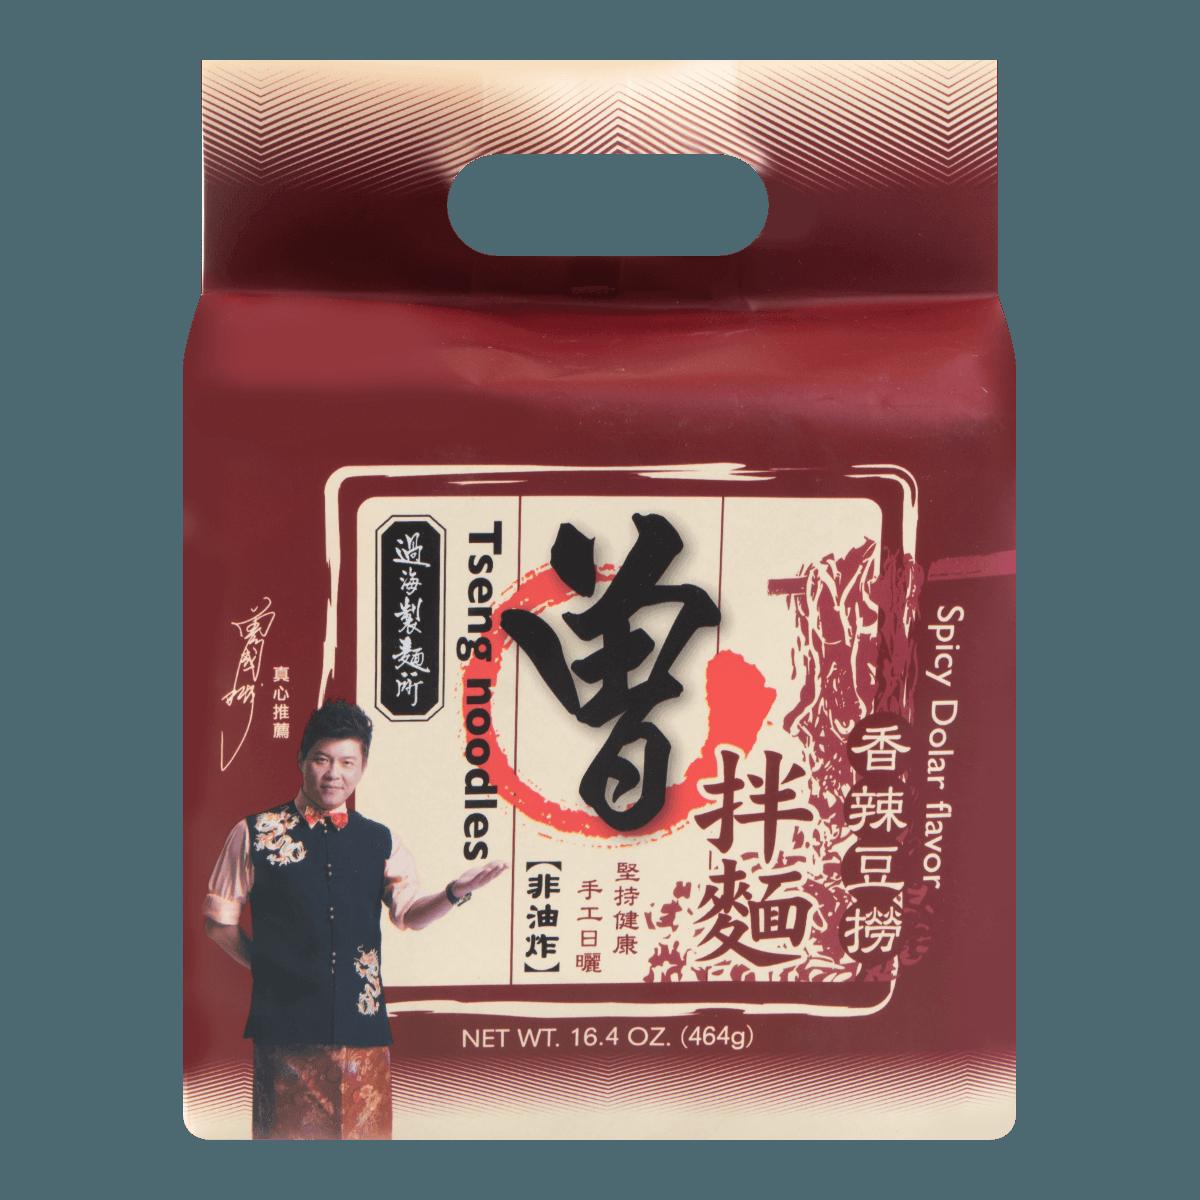 TSENG Sichuan Dolar Instant Noodles 4 pack 464g